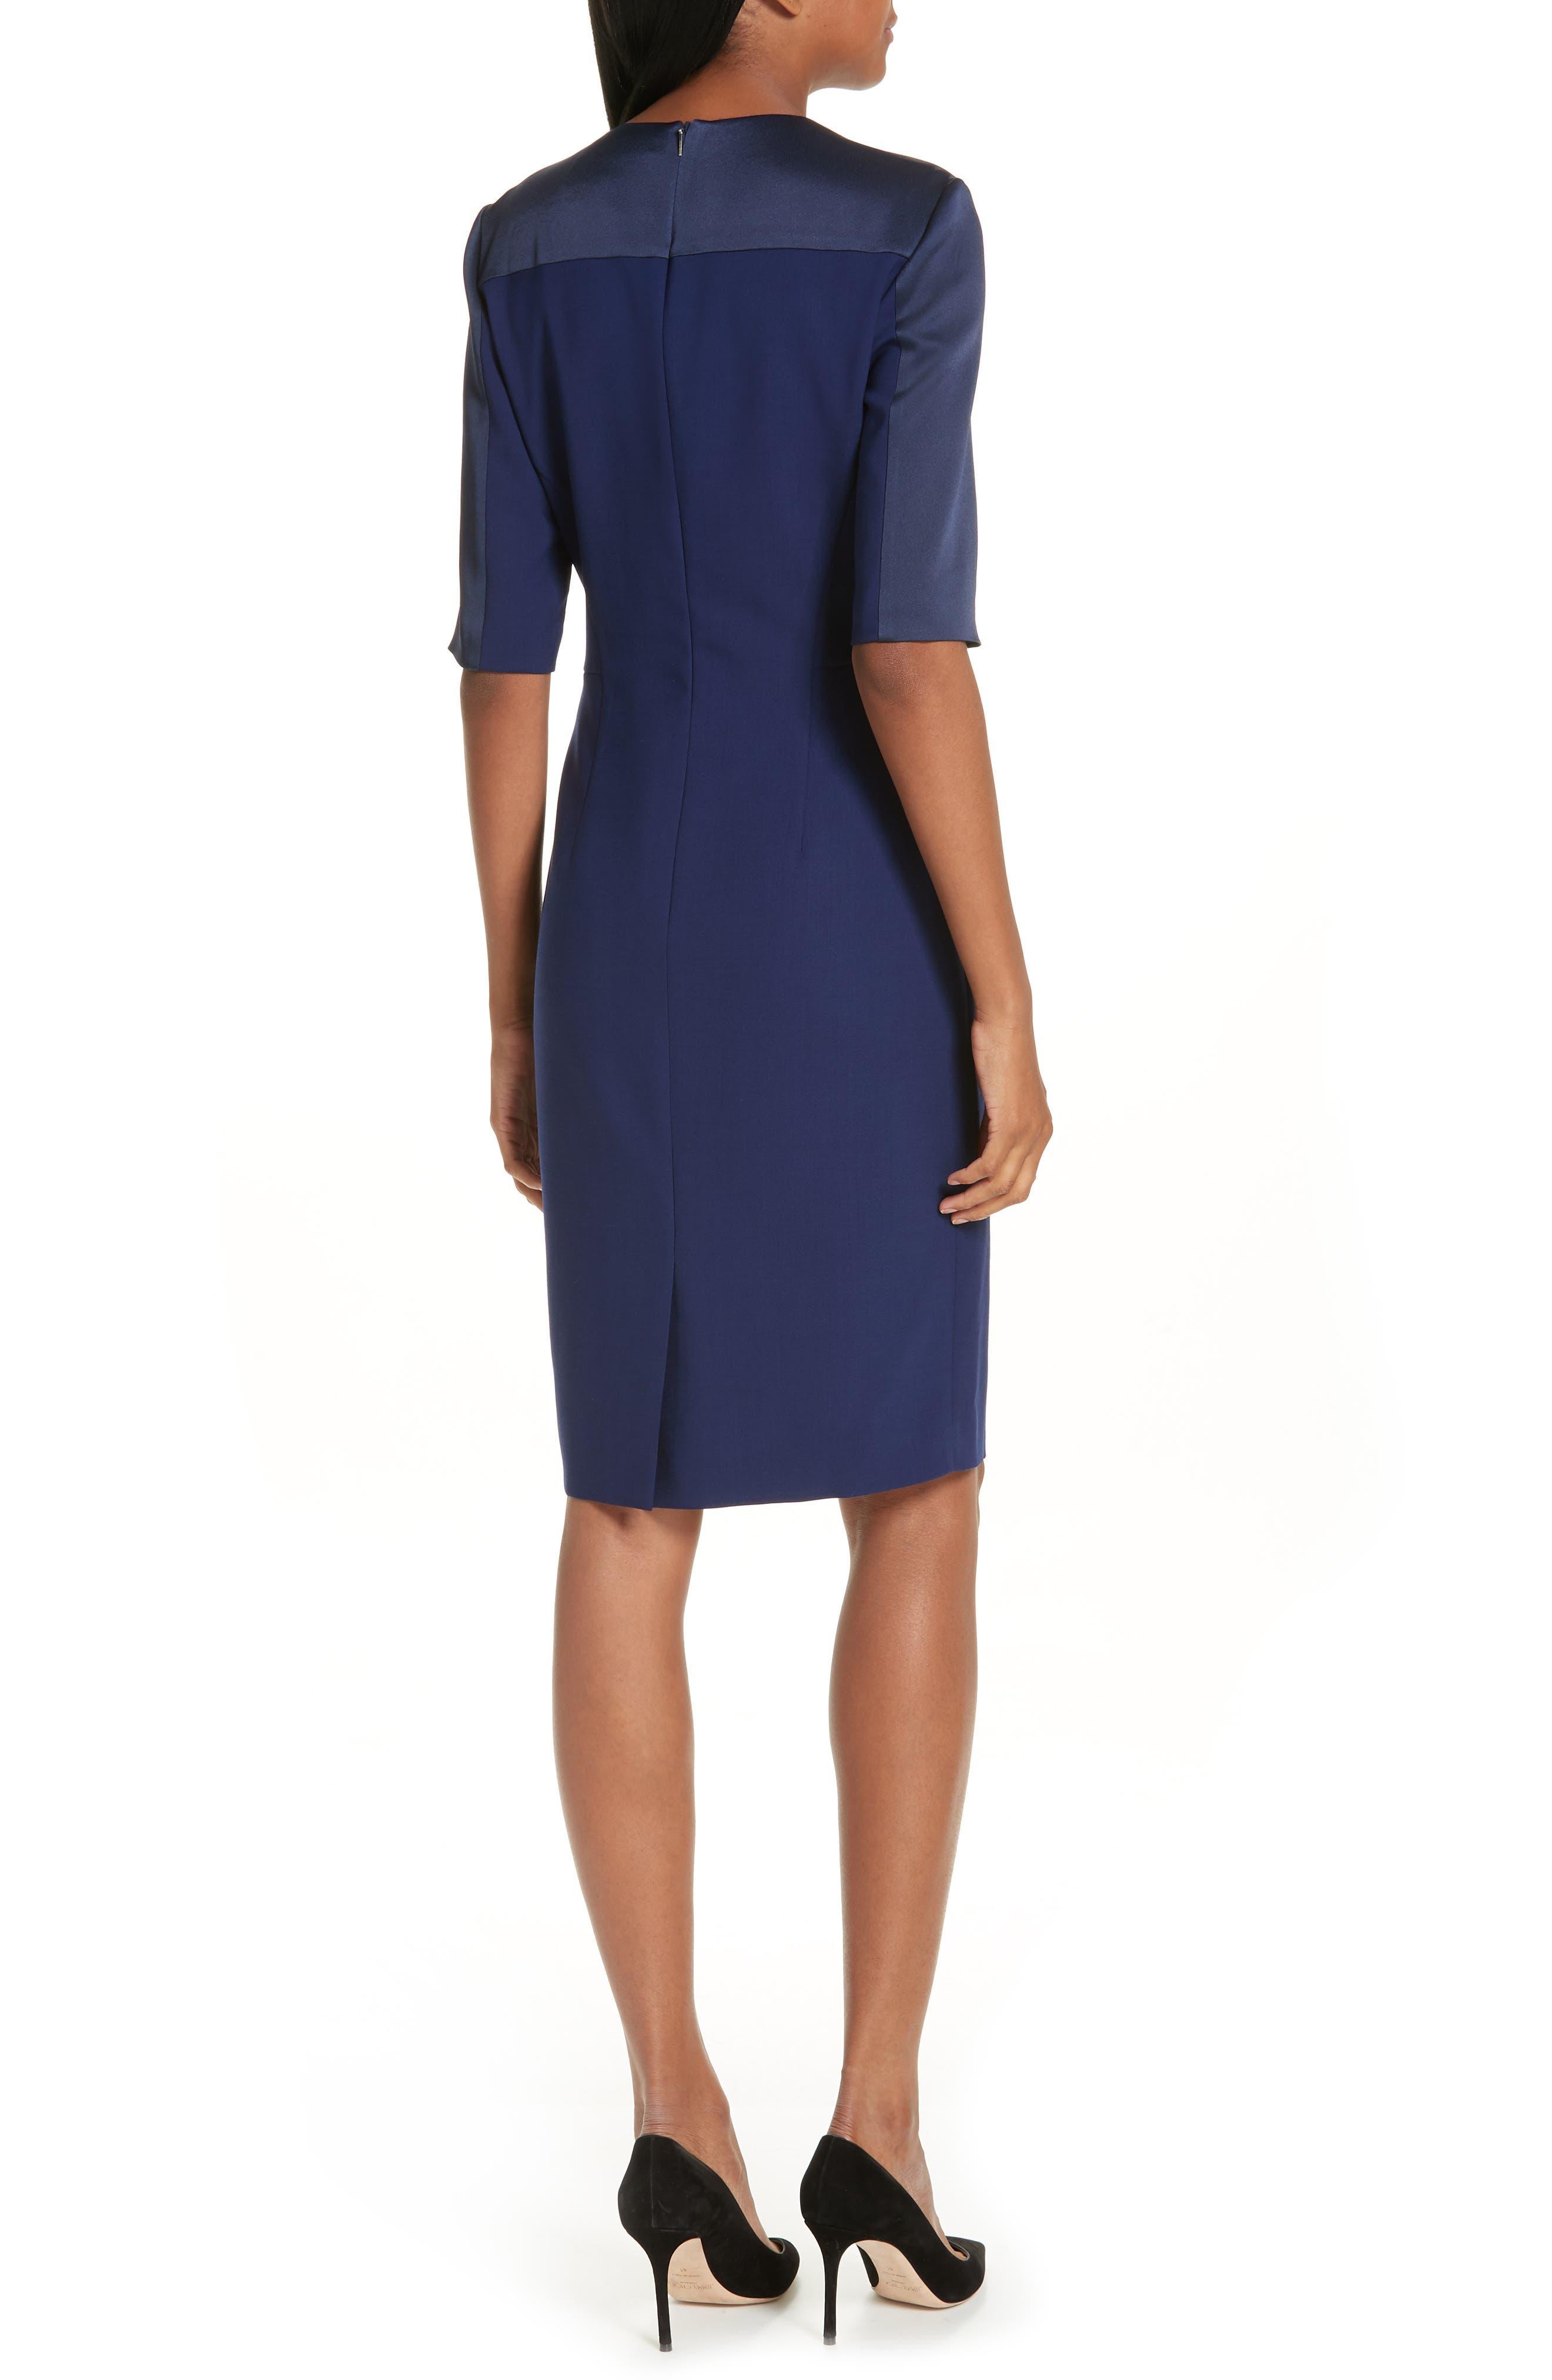 Danufa Stretch Wool Sheath Dress,                             Alternate thumbnail 2, color,                             INK BLUE